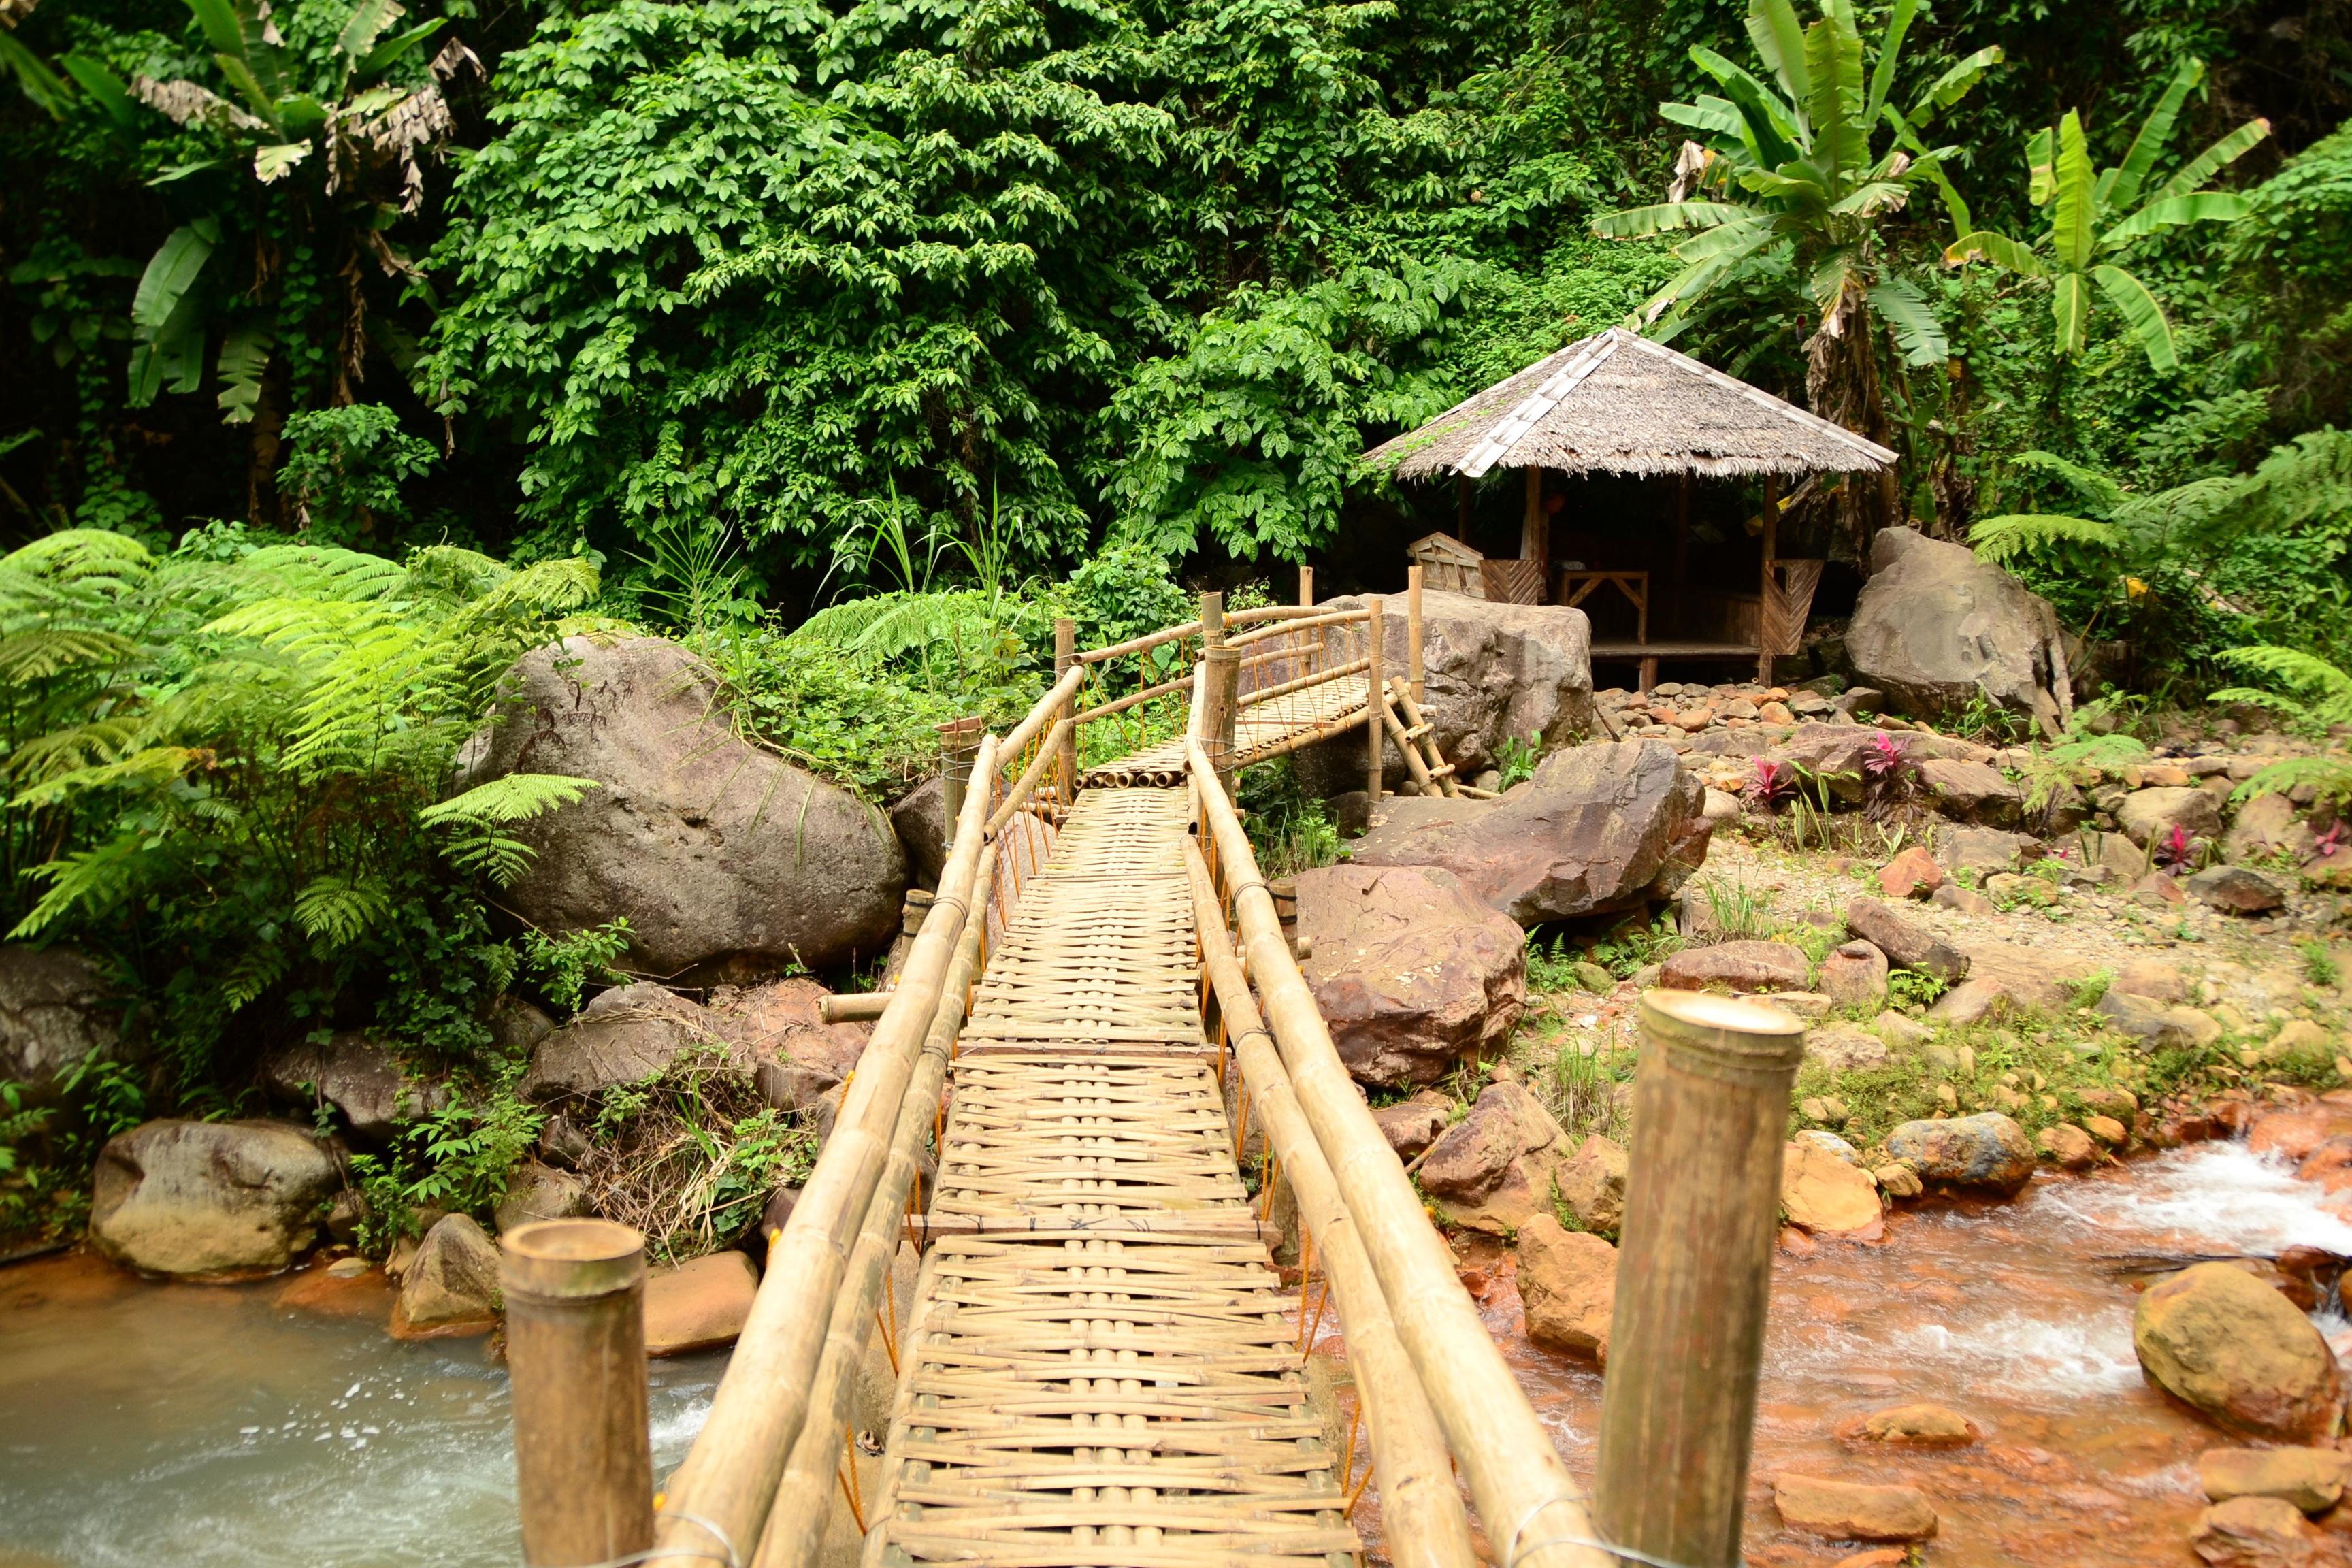 Fotos gratis bosque puente cruce selva jard n bamb for Jardin bambu